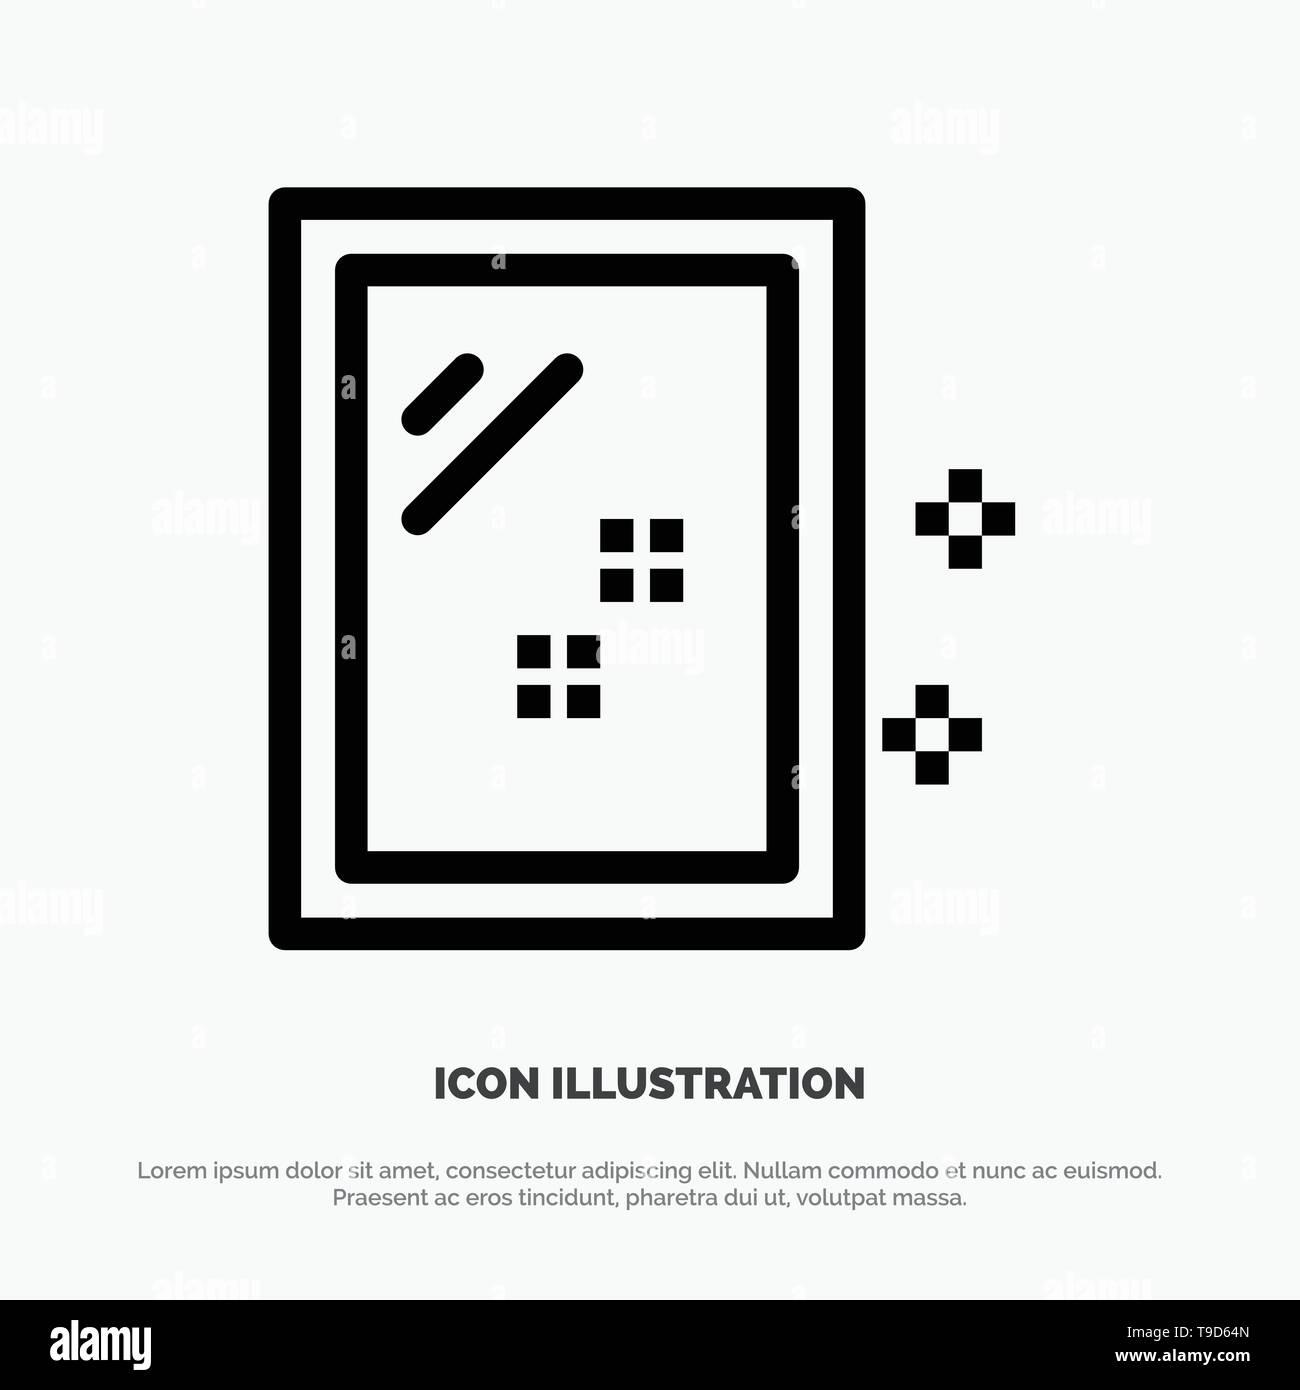 Door, Mirror, Cleaning, Wash Line Icon Vector - Stock Image